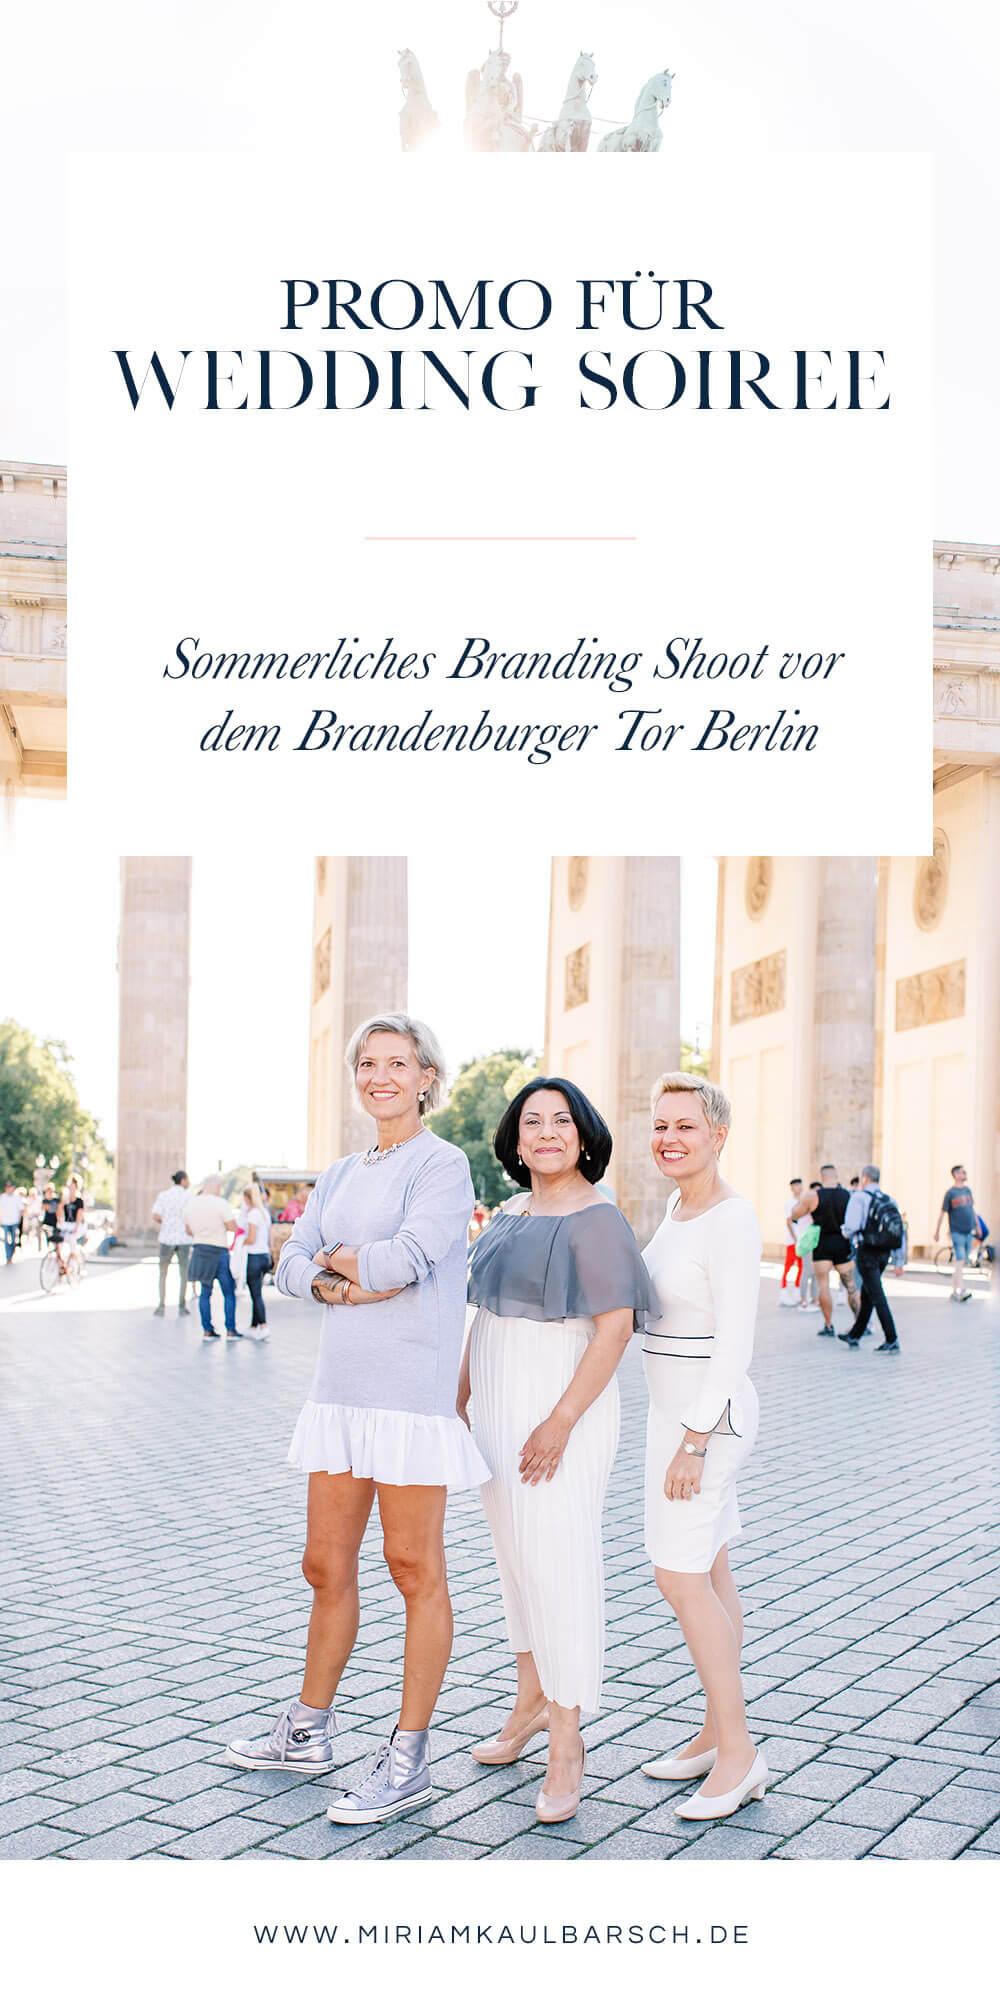 Promo Shoot für Wedding Soirée vor dem Brandenburger Tor Berlin